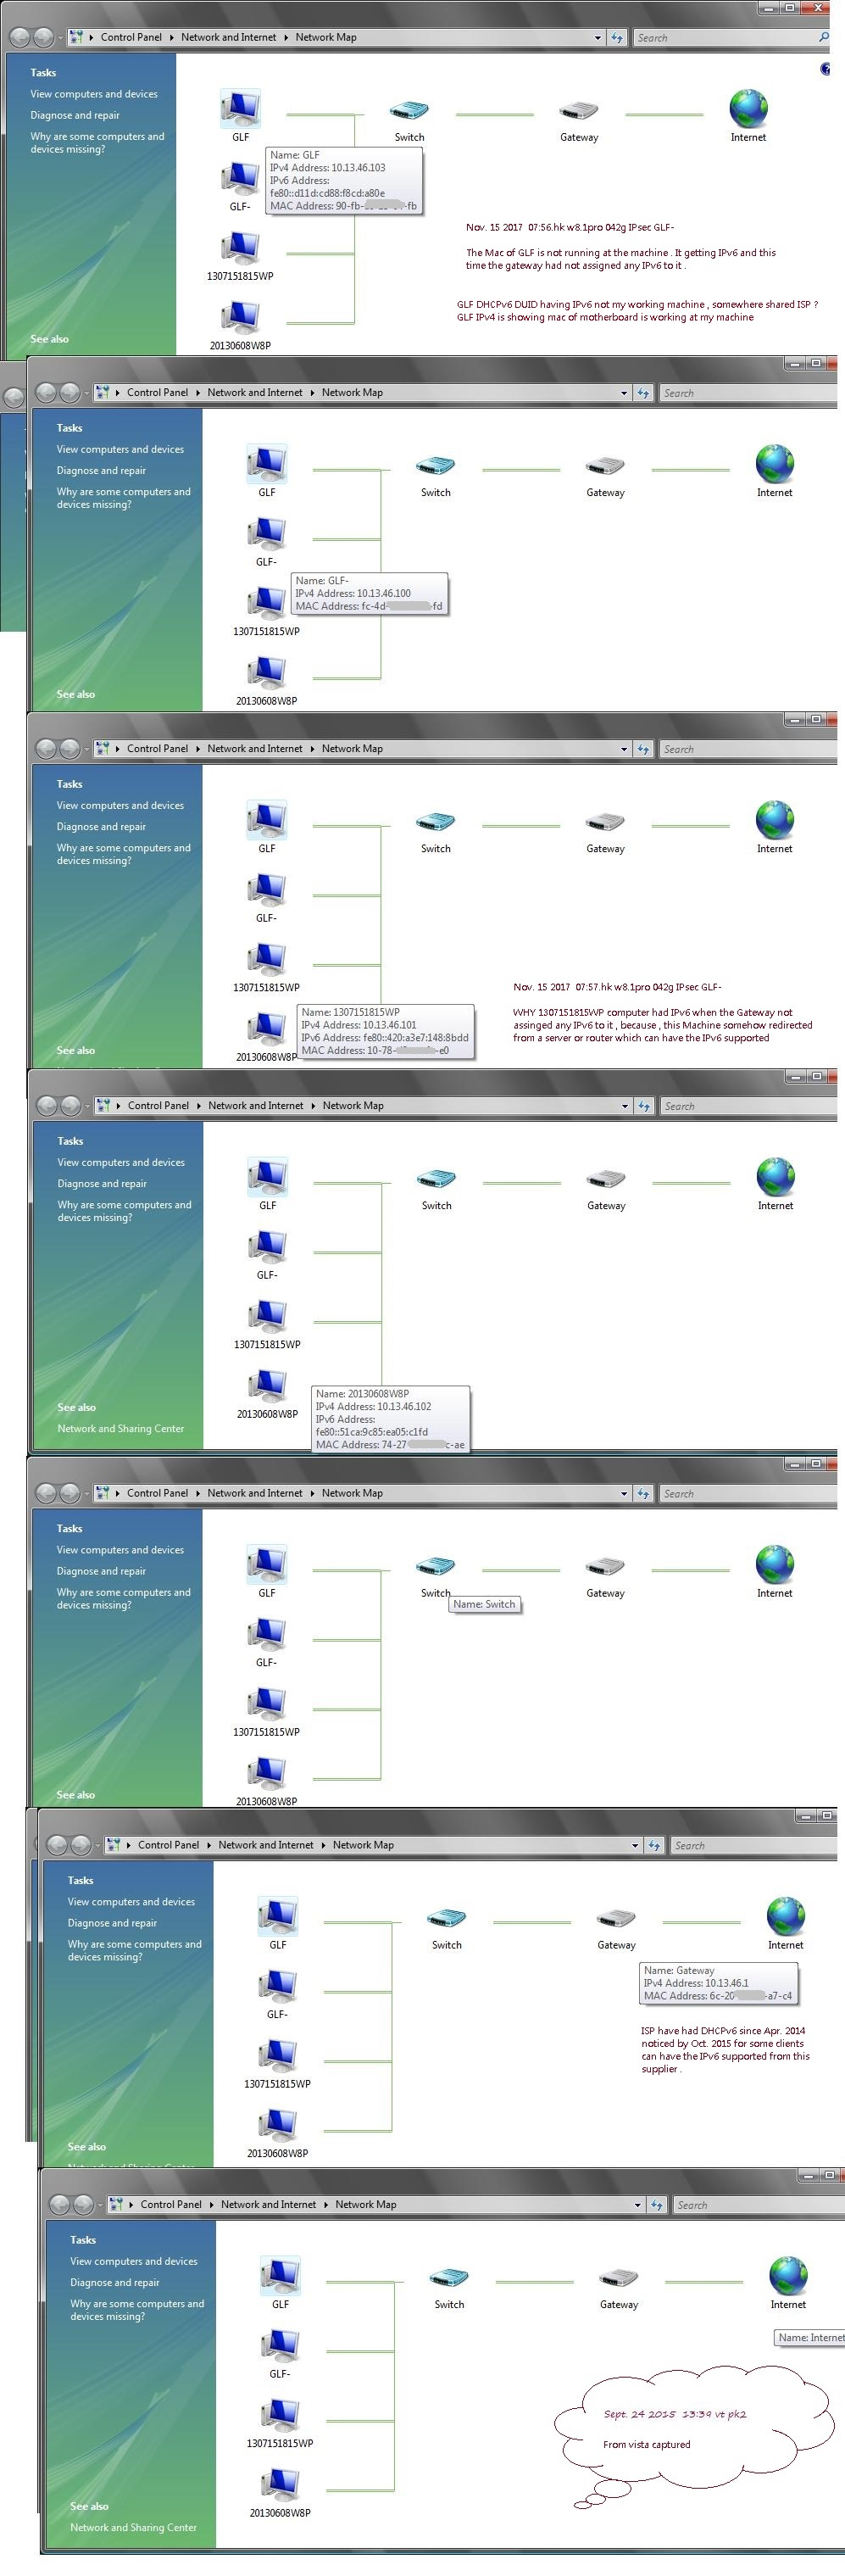 GLF,x 1 working mac having IPv6 , GLF- , 1307151815WP, 20130608W8P